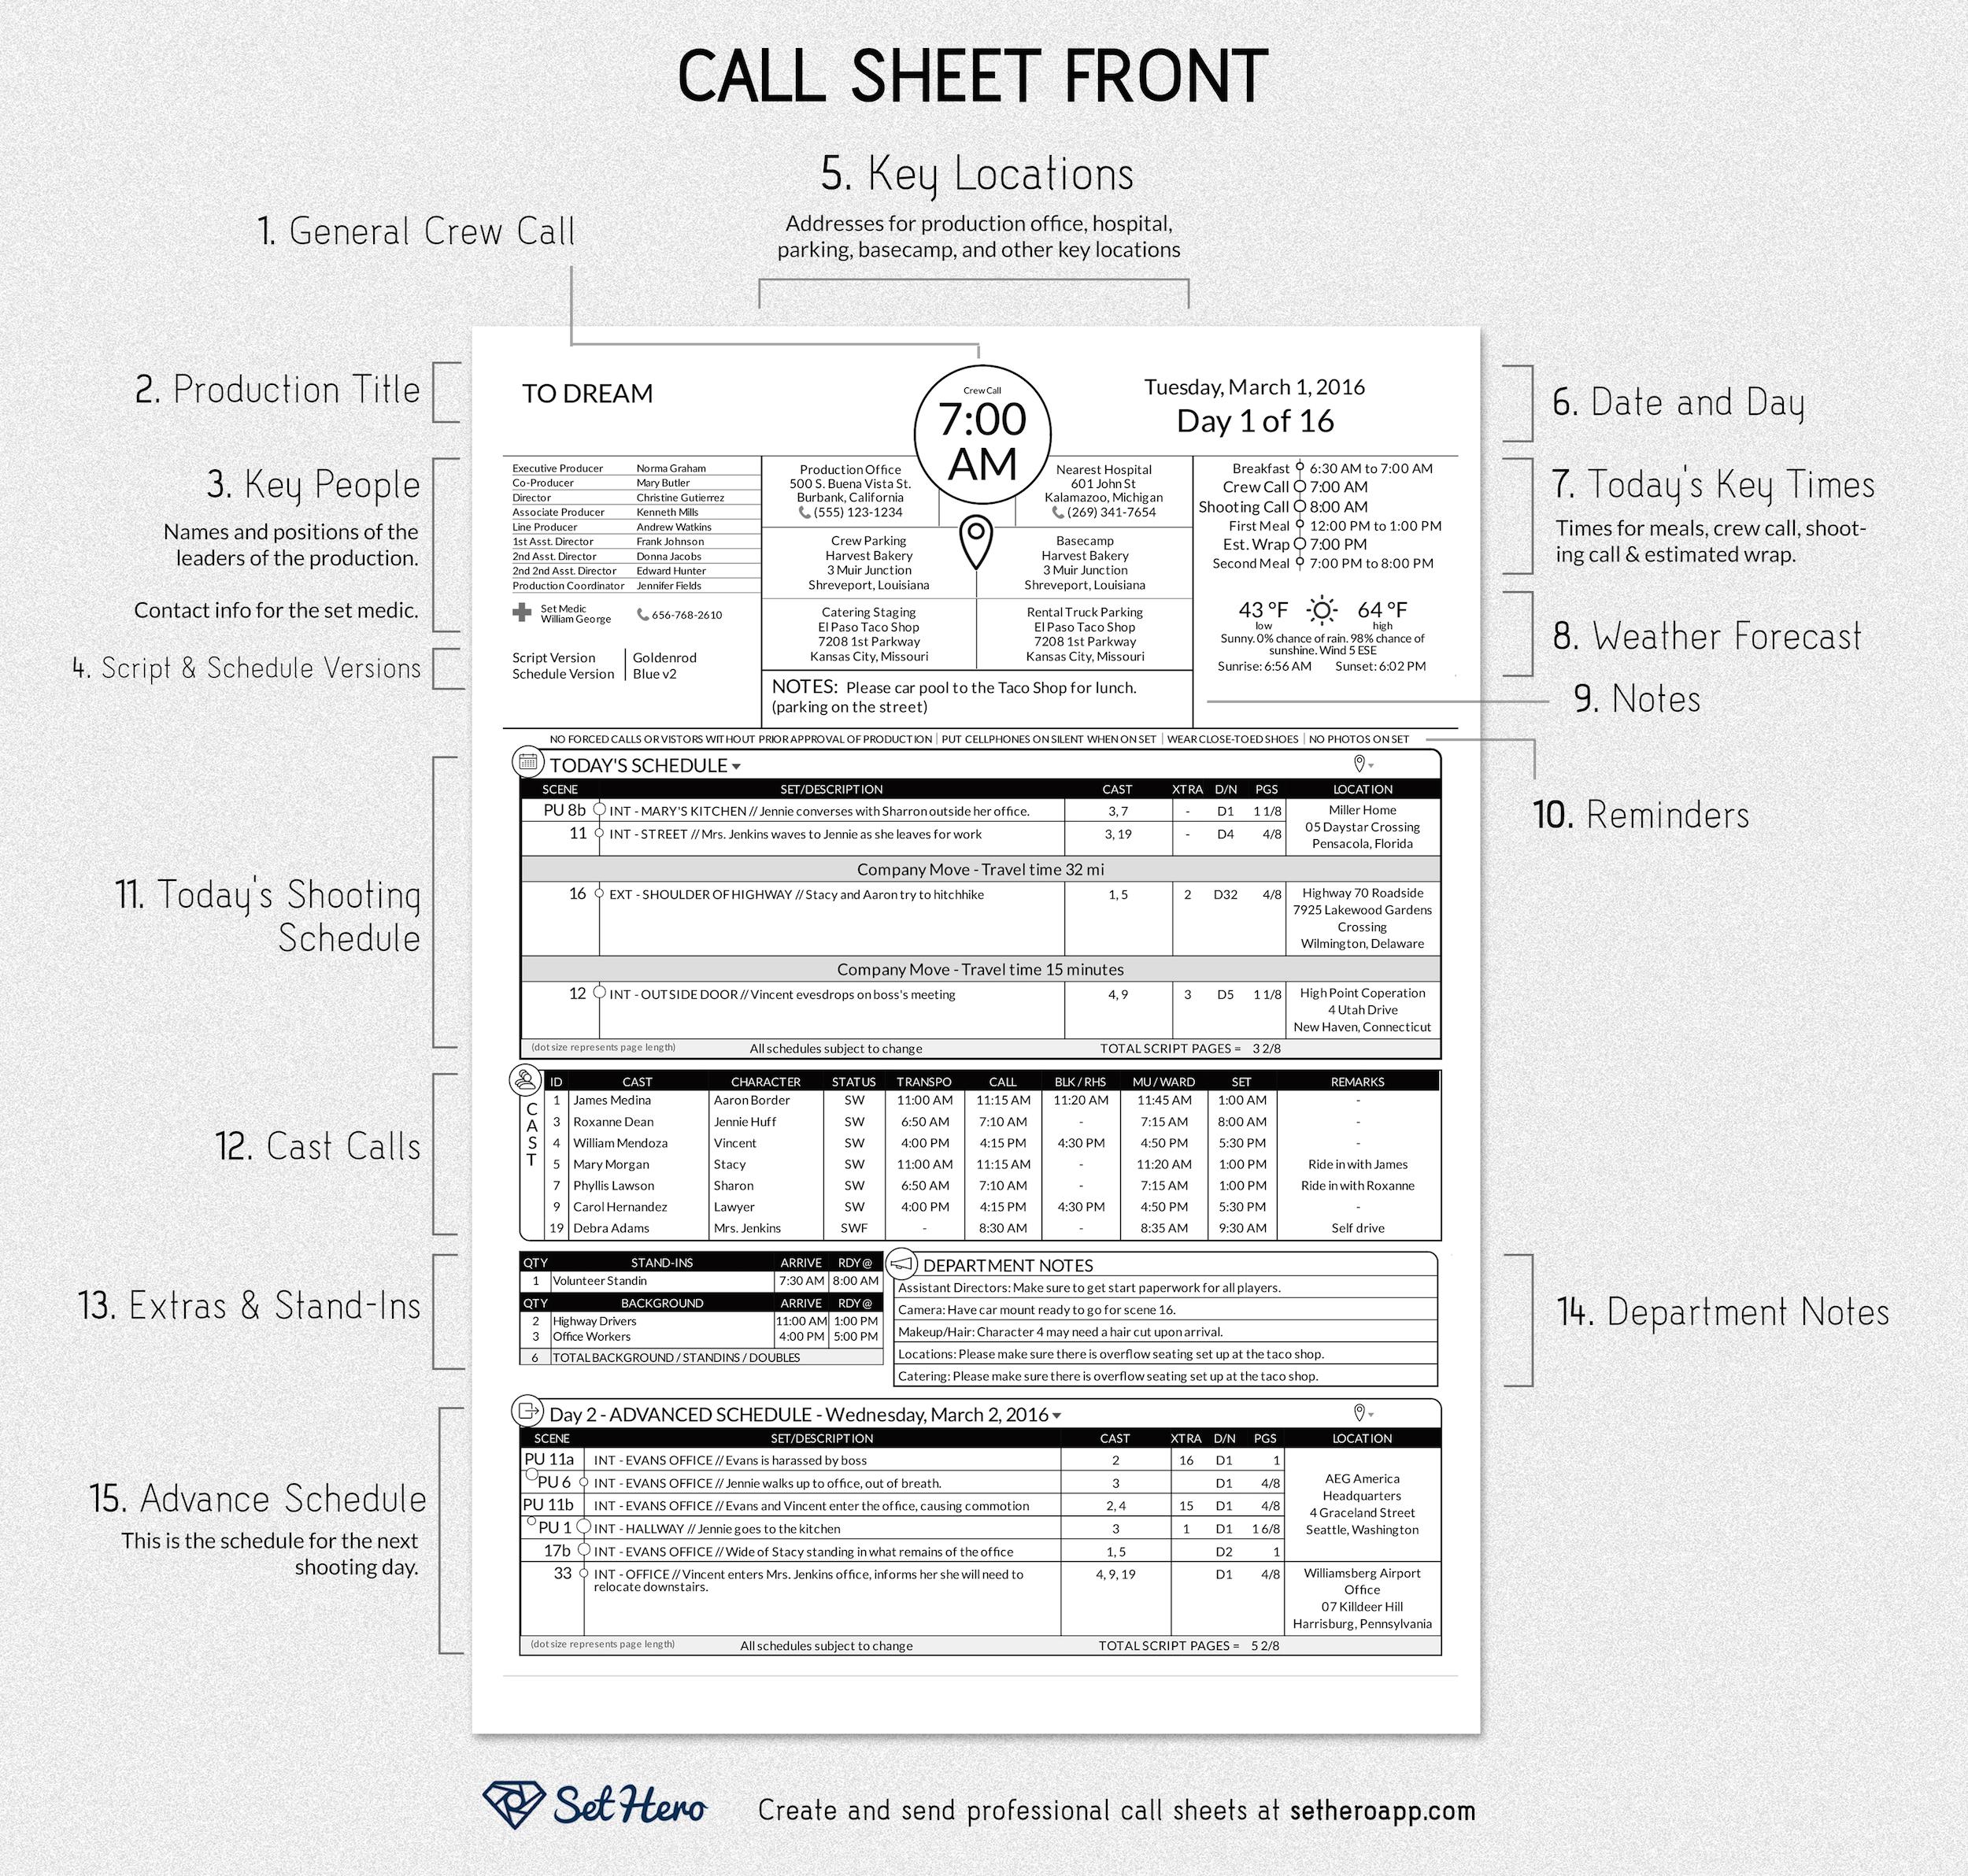 Creating Professional Call Sheets